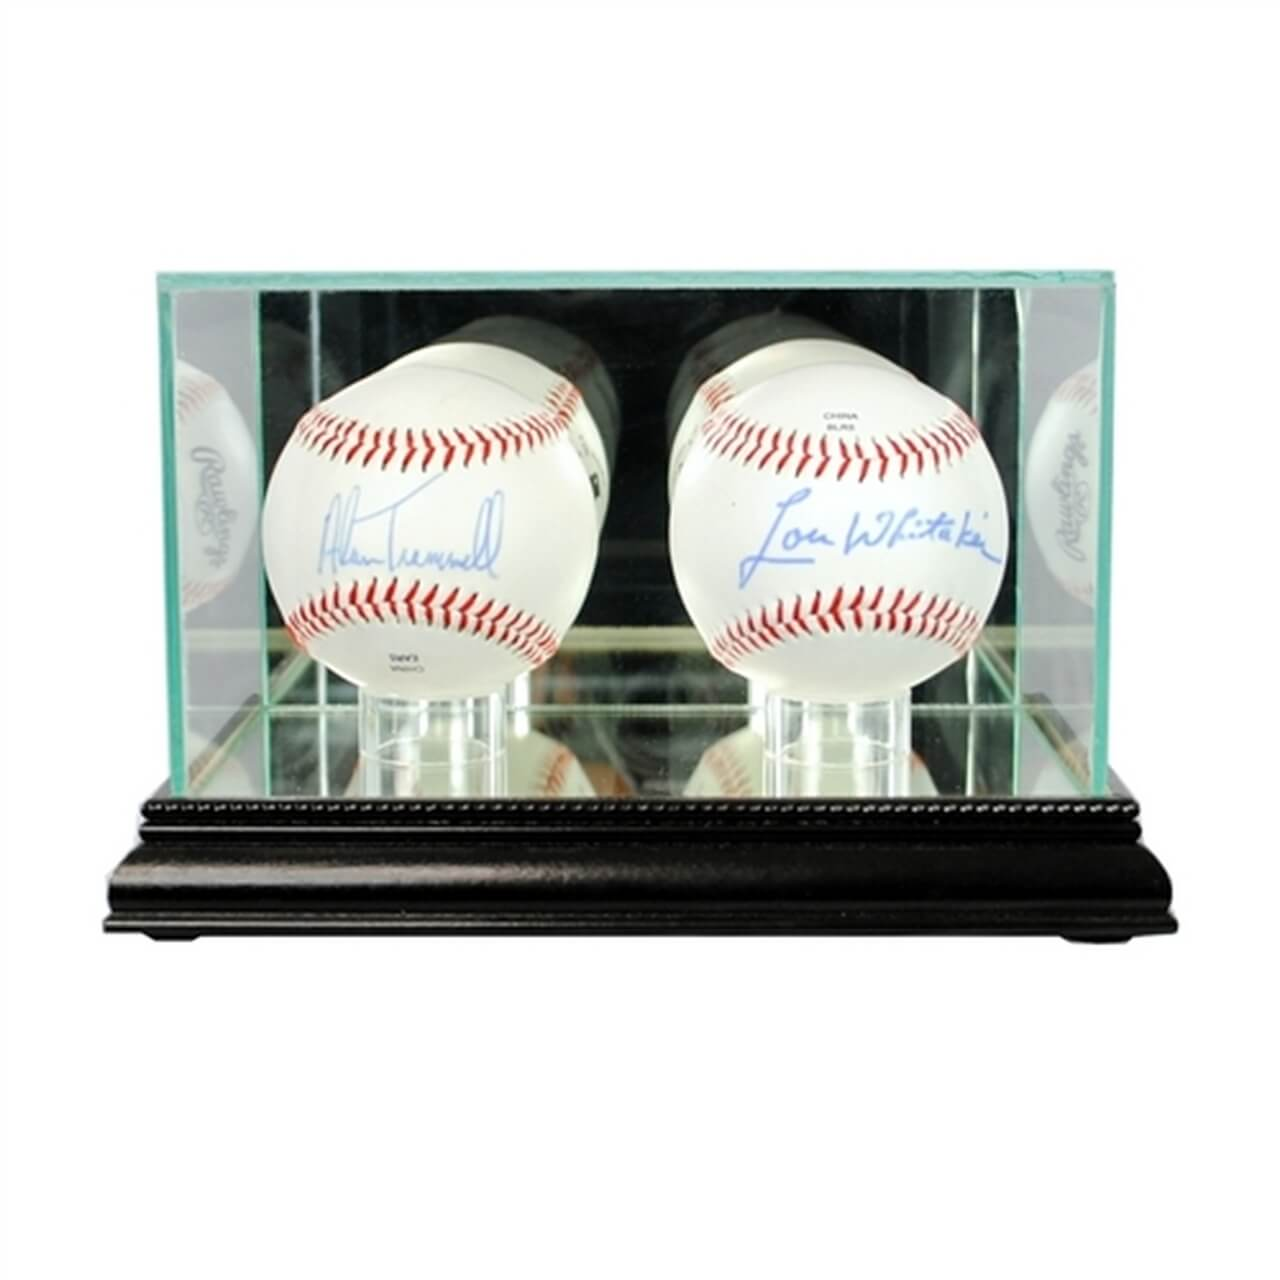 Two baseballs inside a glass display case